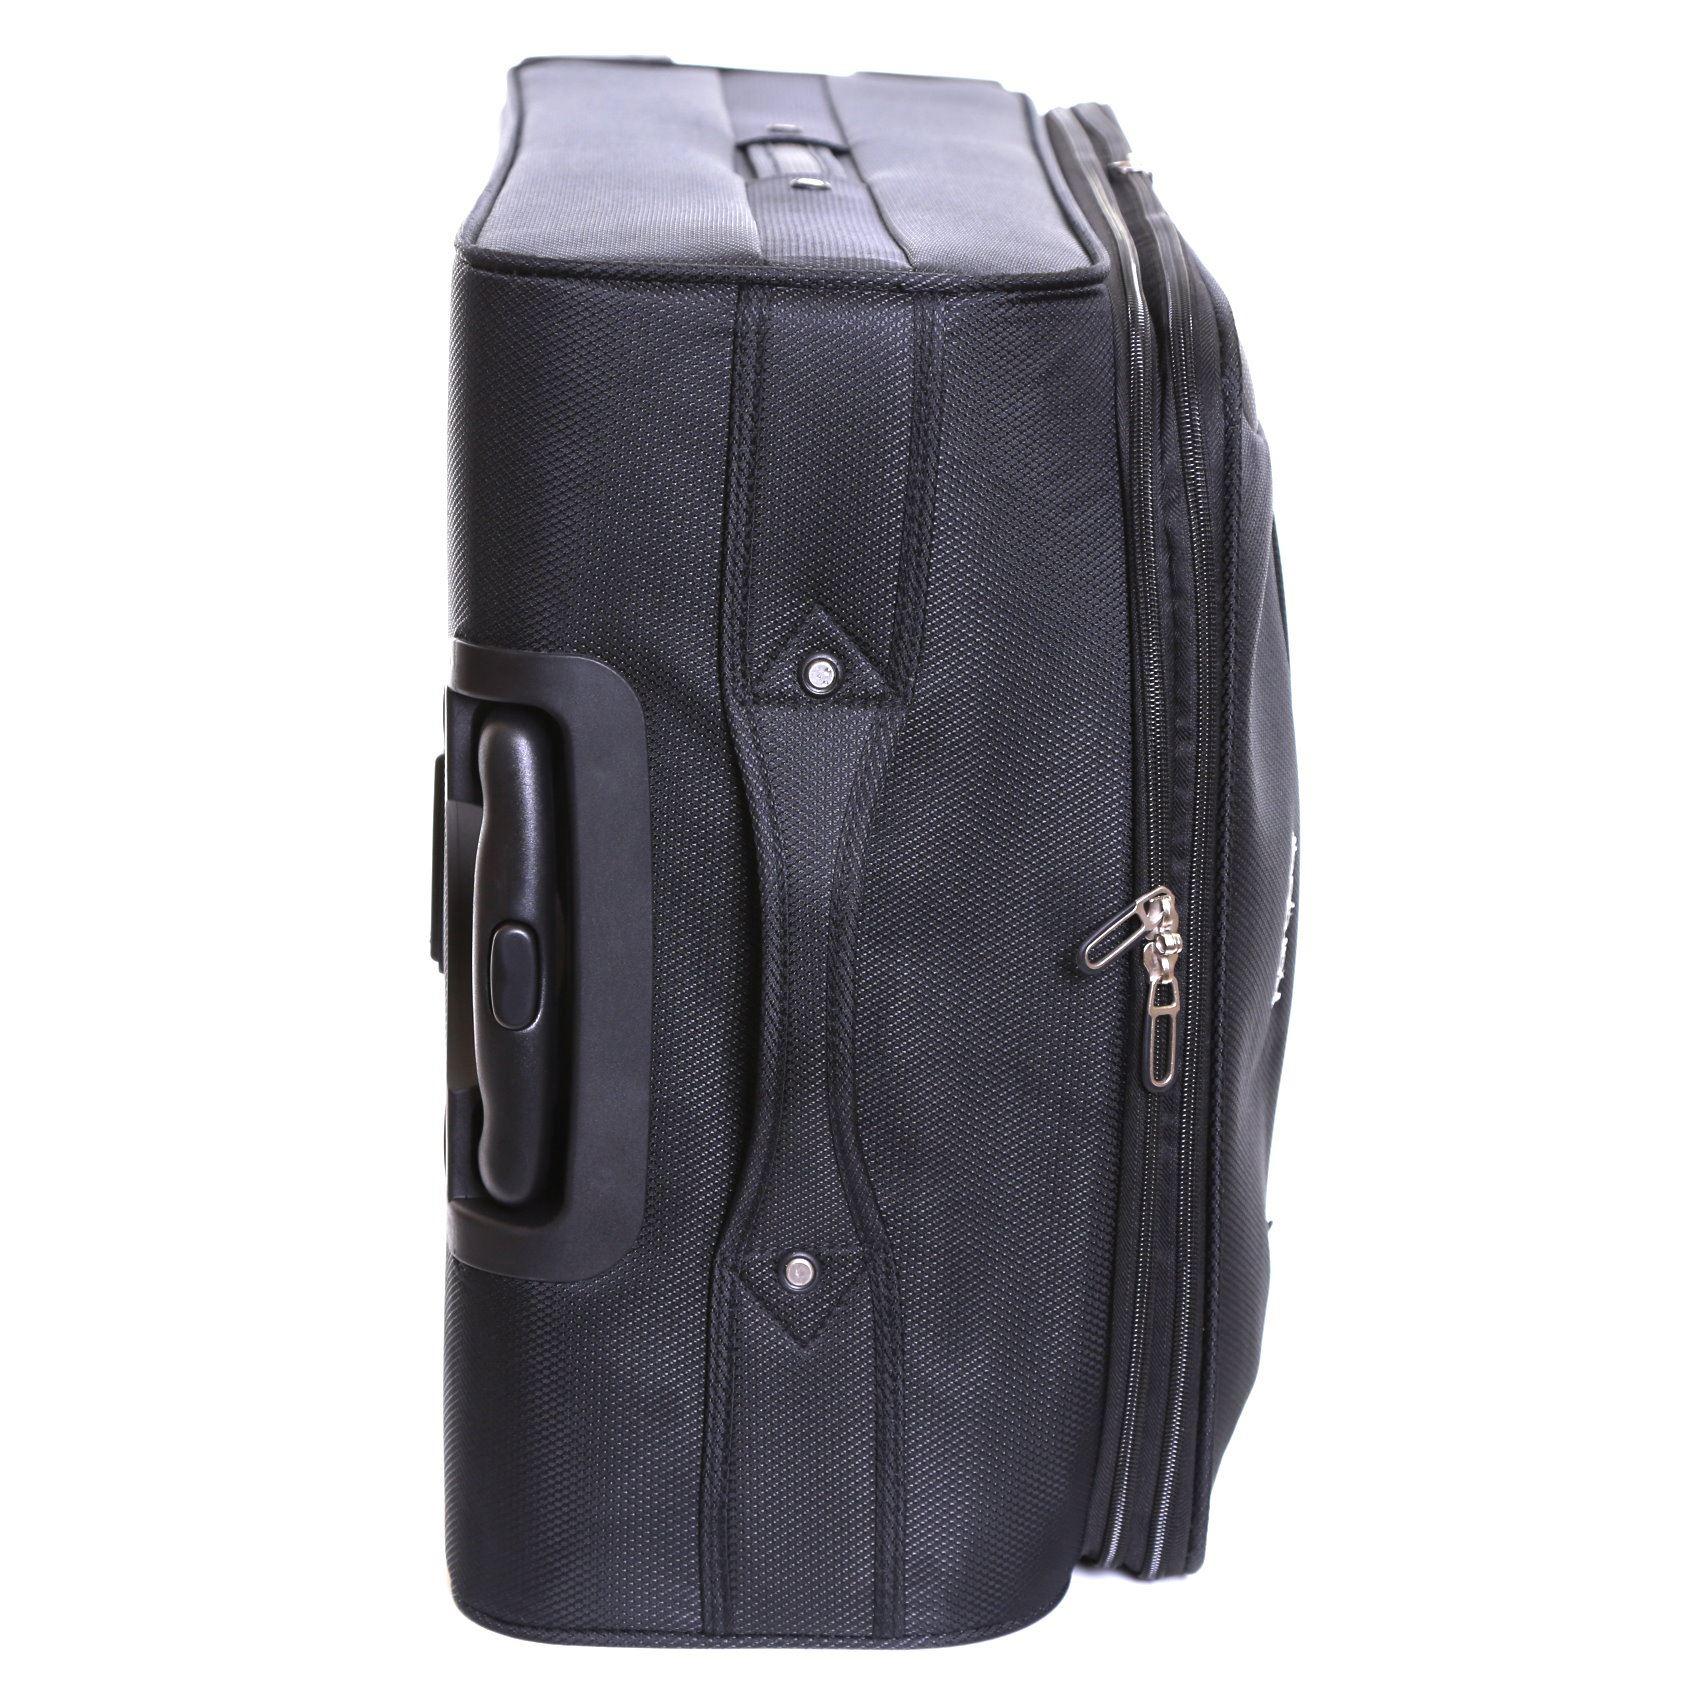 Karabar Extra Large XXL 80 cm Lightweight Suitcase Luggage Trolley ...